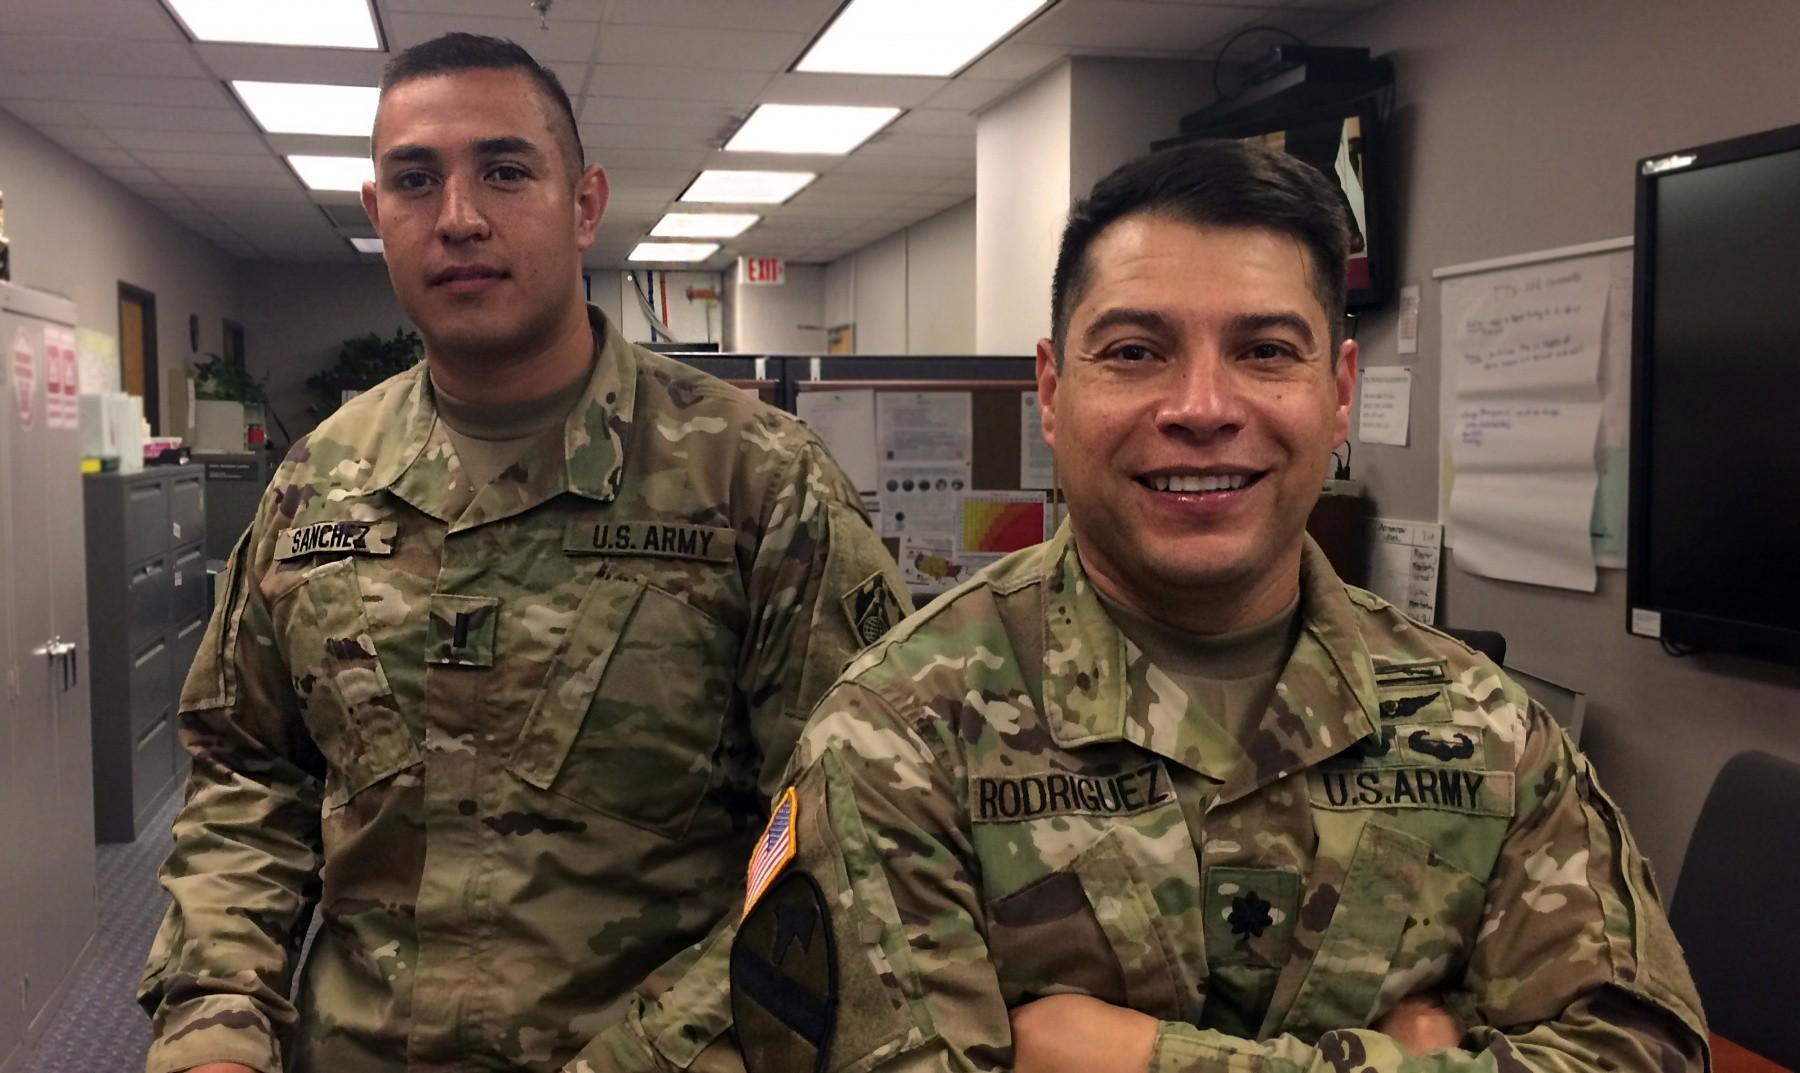 Hispanic soldiers